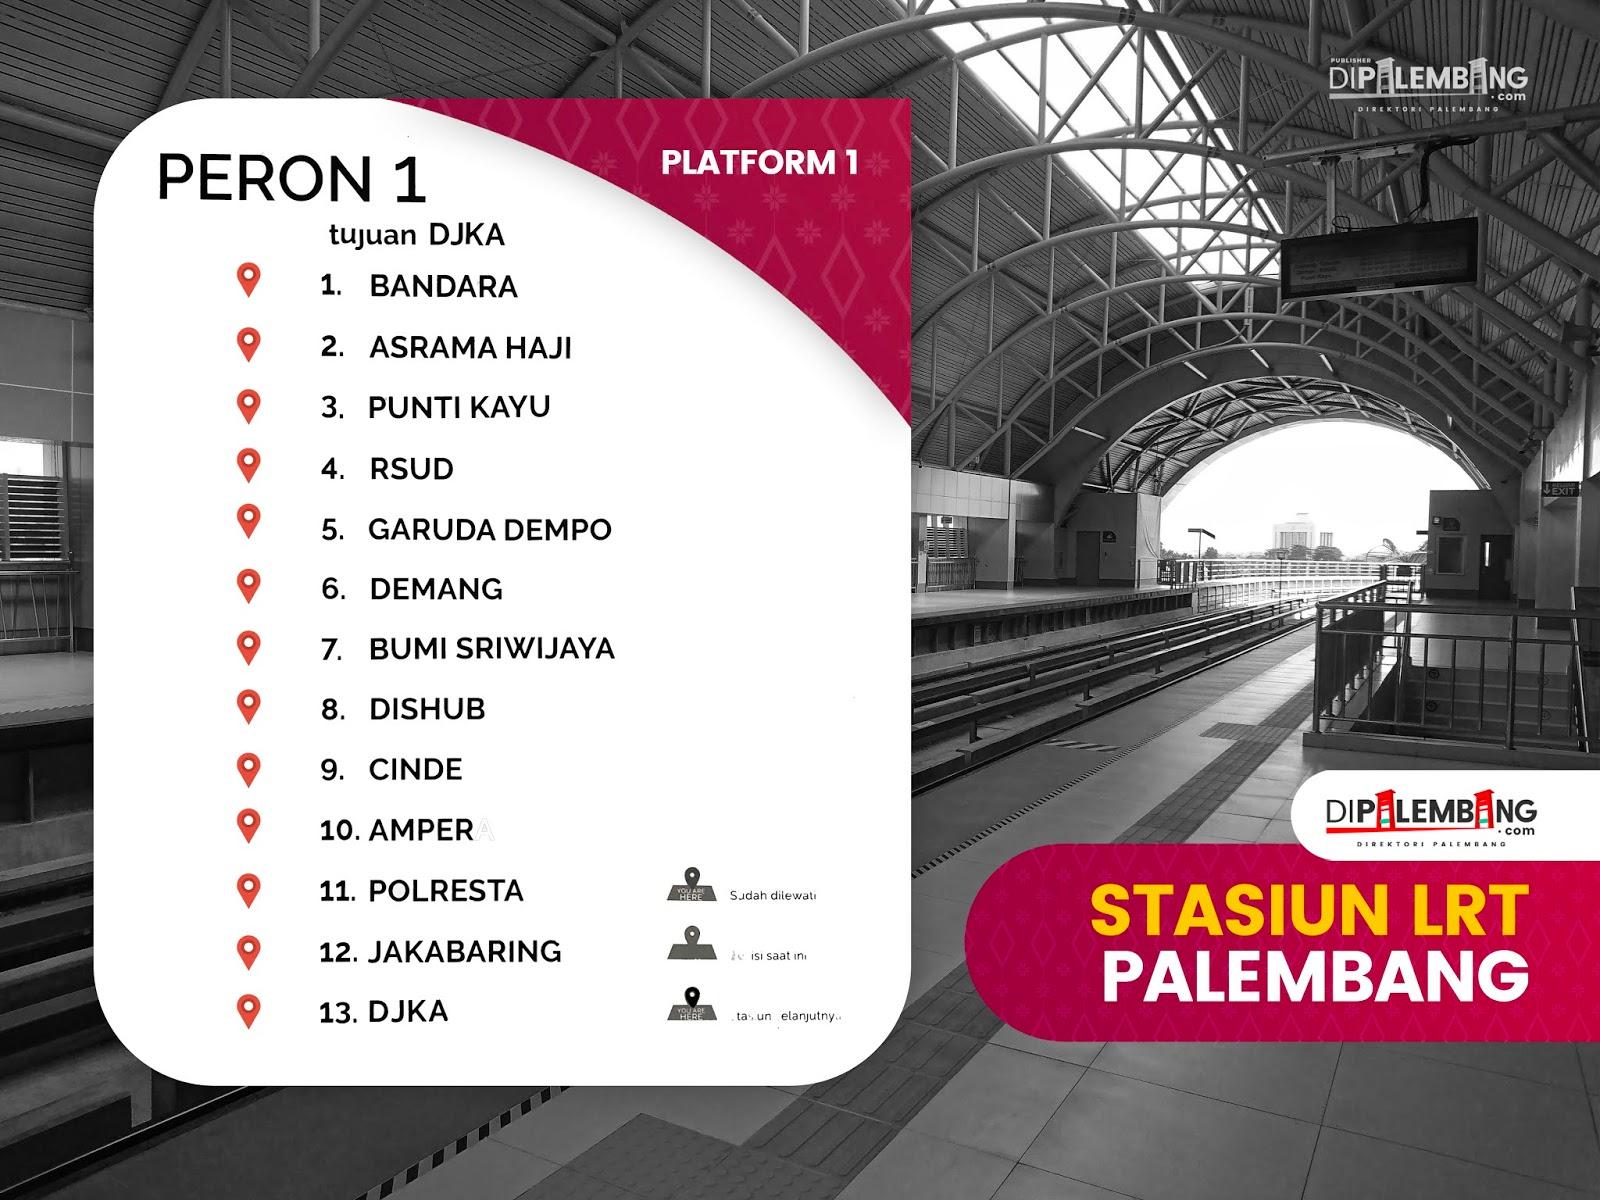 Lowongan Kerja Lrt Palembang 2020 Walk In Interview Selasa 13 Oktober 2020 Pukul 09 00 Wib